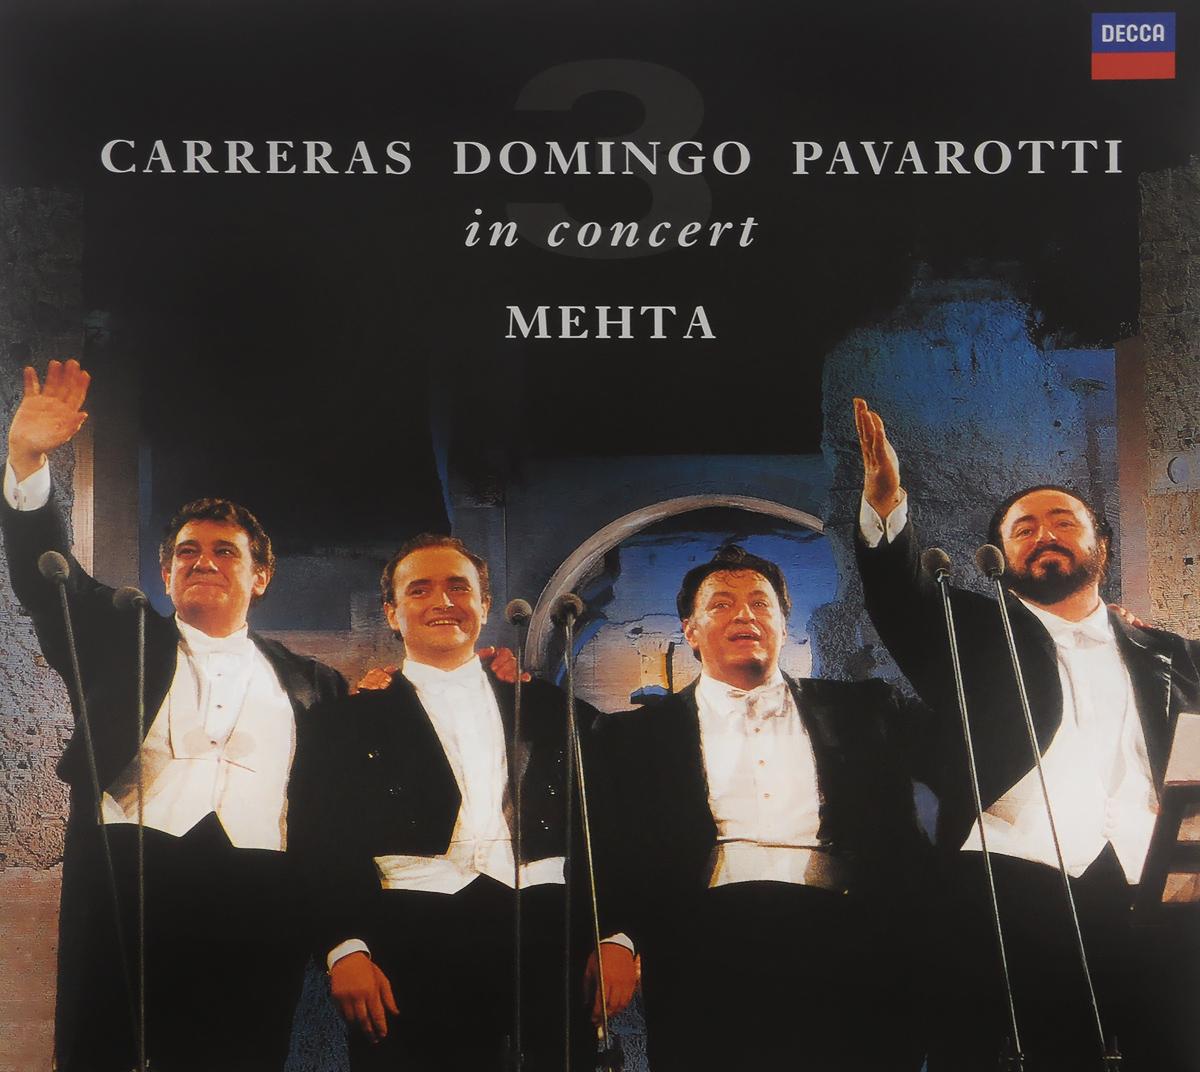 Carreras. Domingo. Pavarotti. Mehta. Three Tenors. 25th Anniversary Edition (LP)